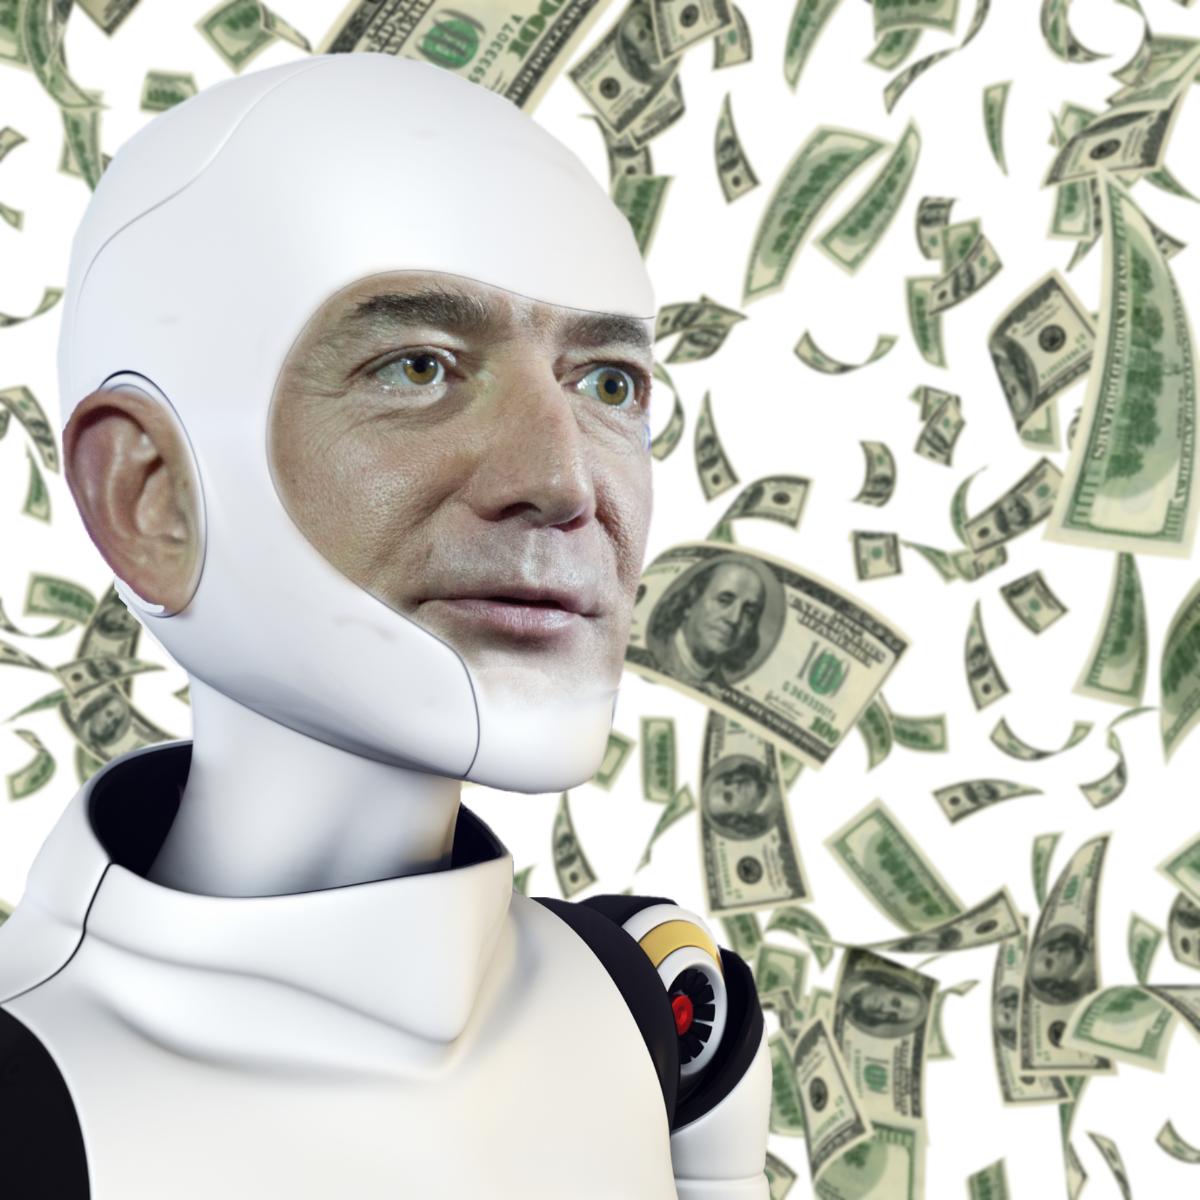 bezos robot android